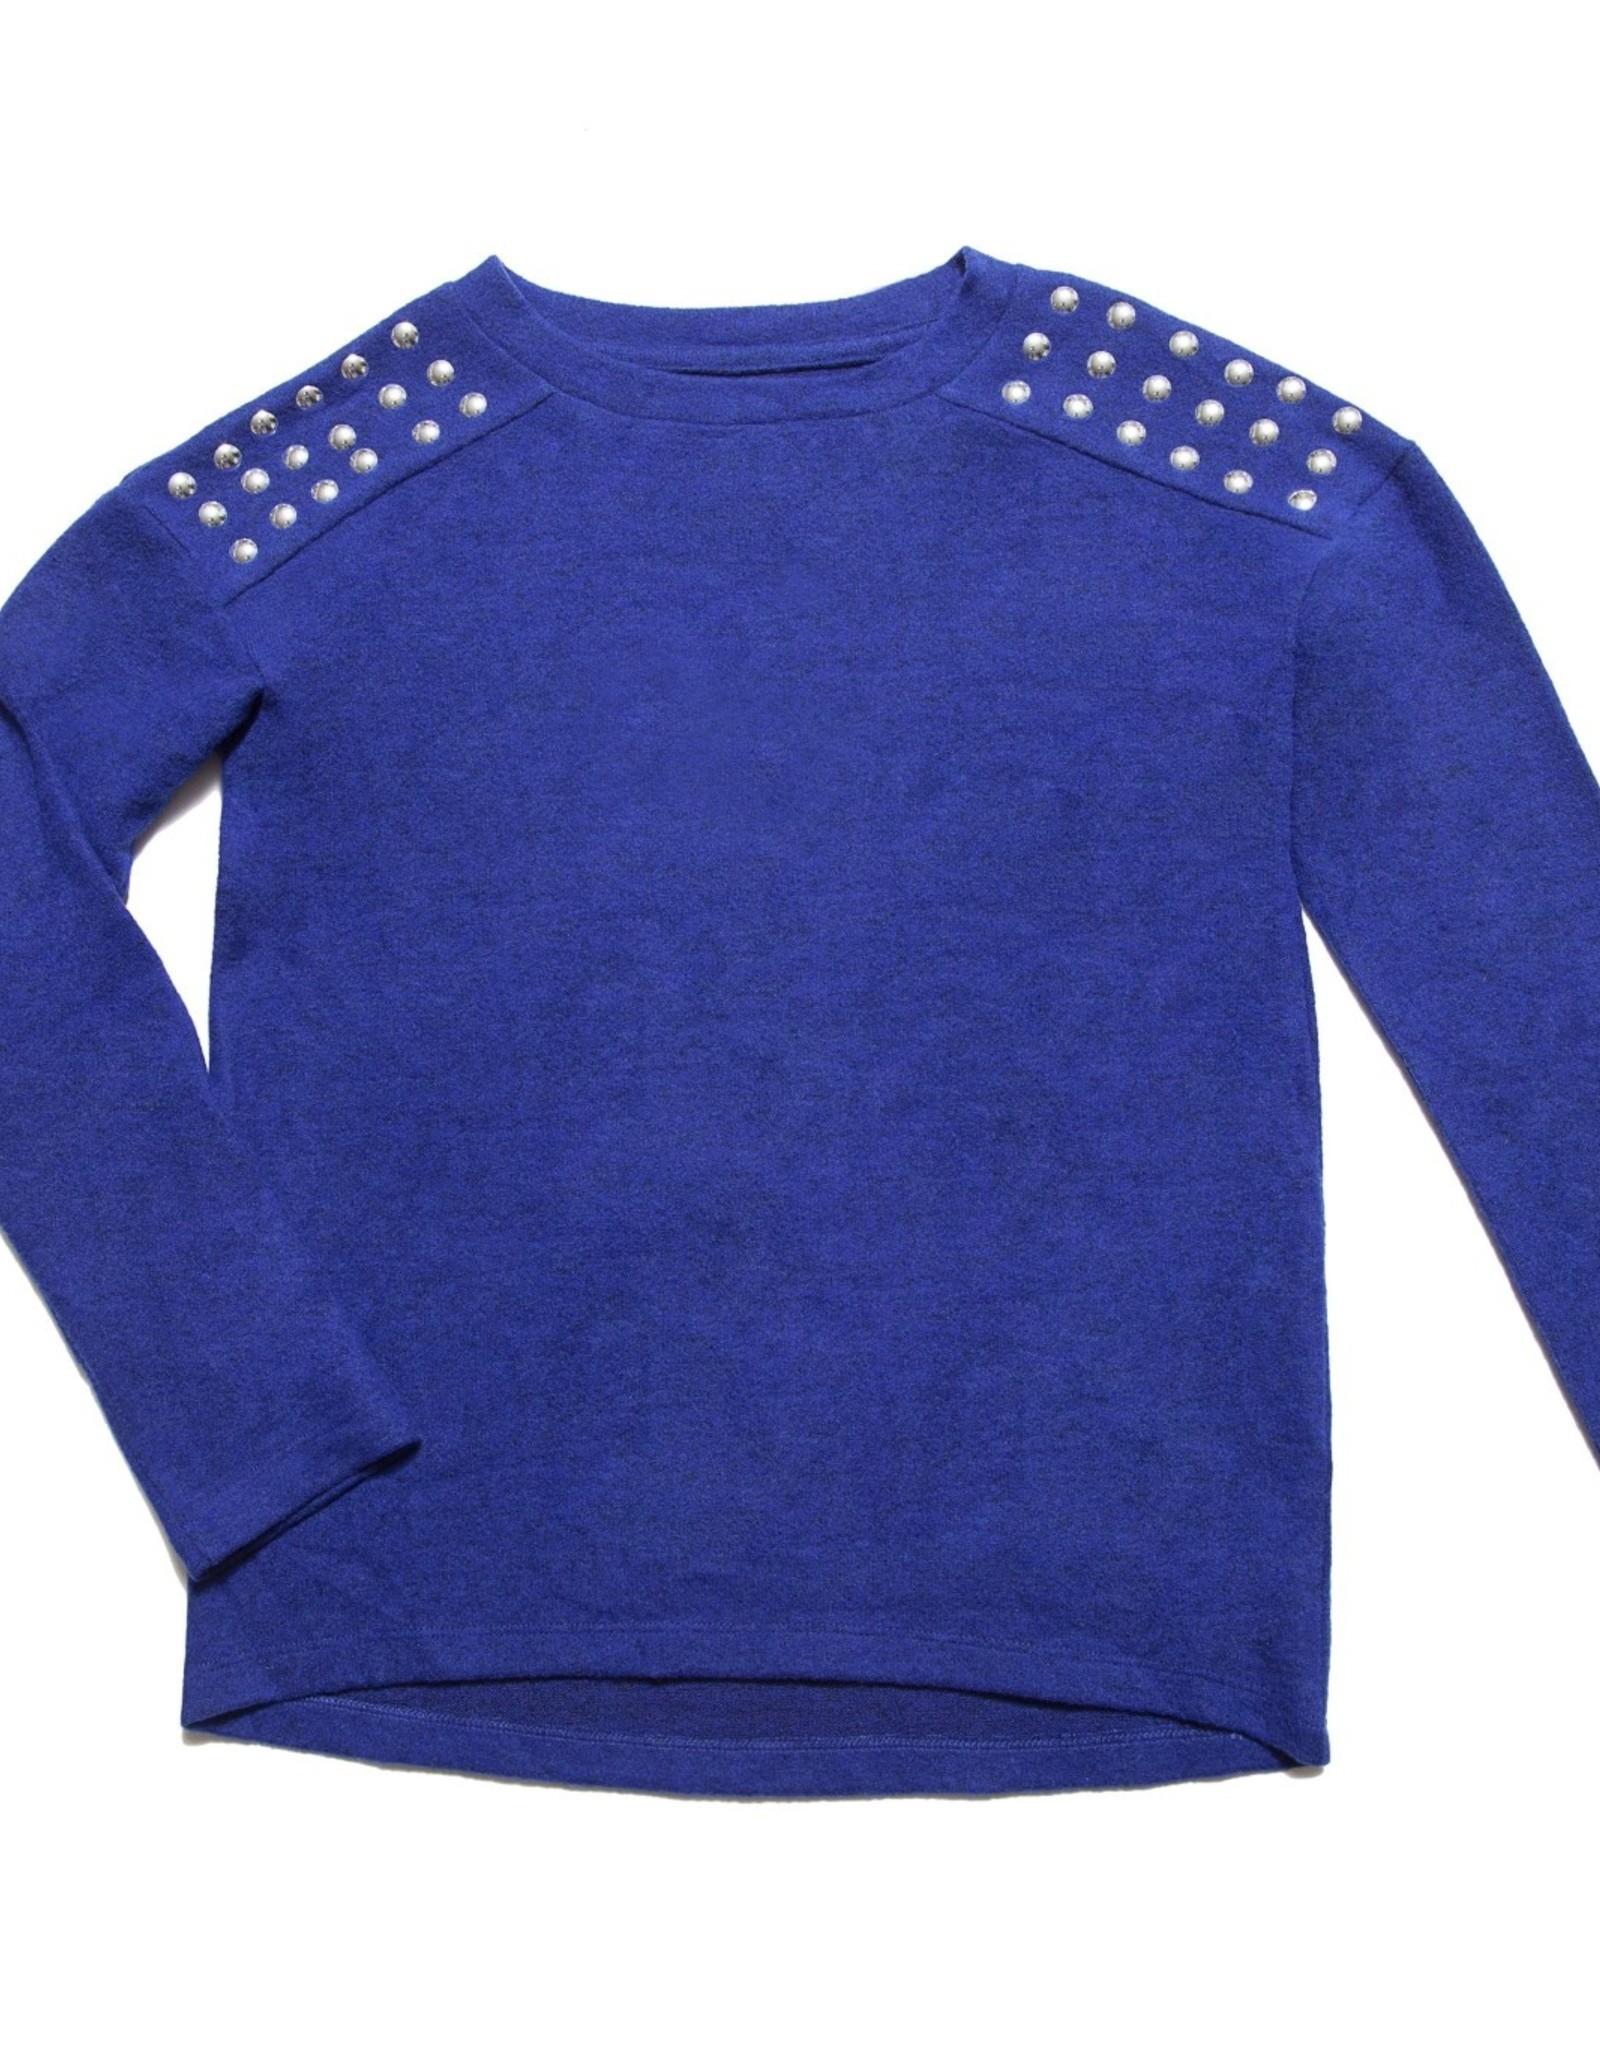 MIA NEW YORK MIA NEW YORK Studded Sweater